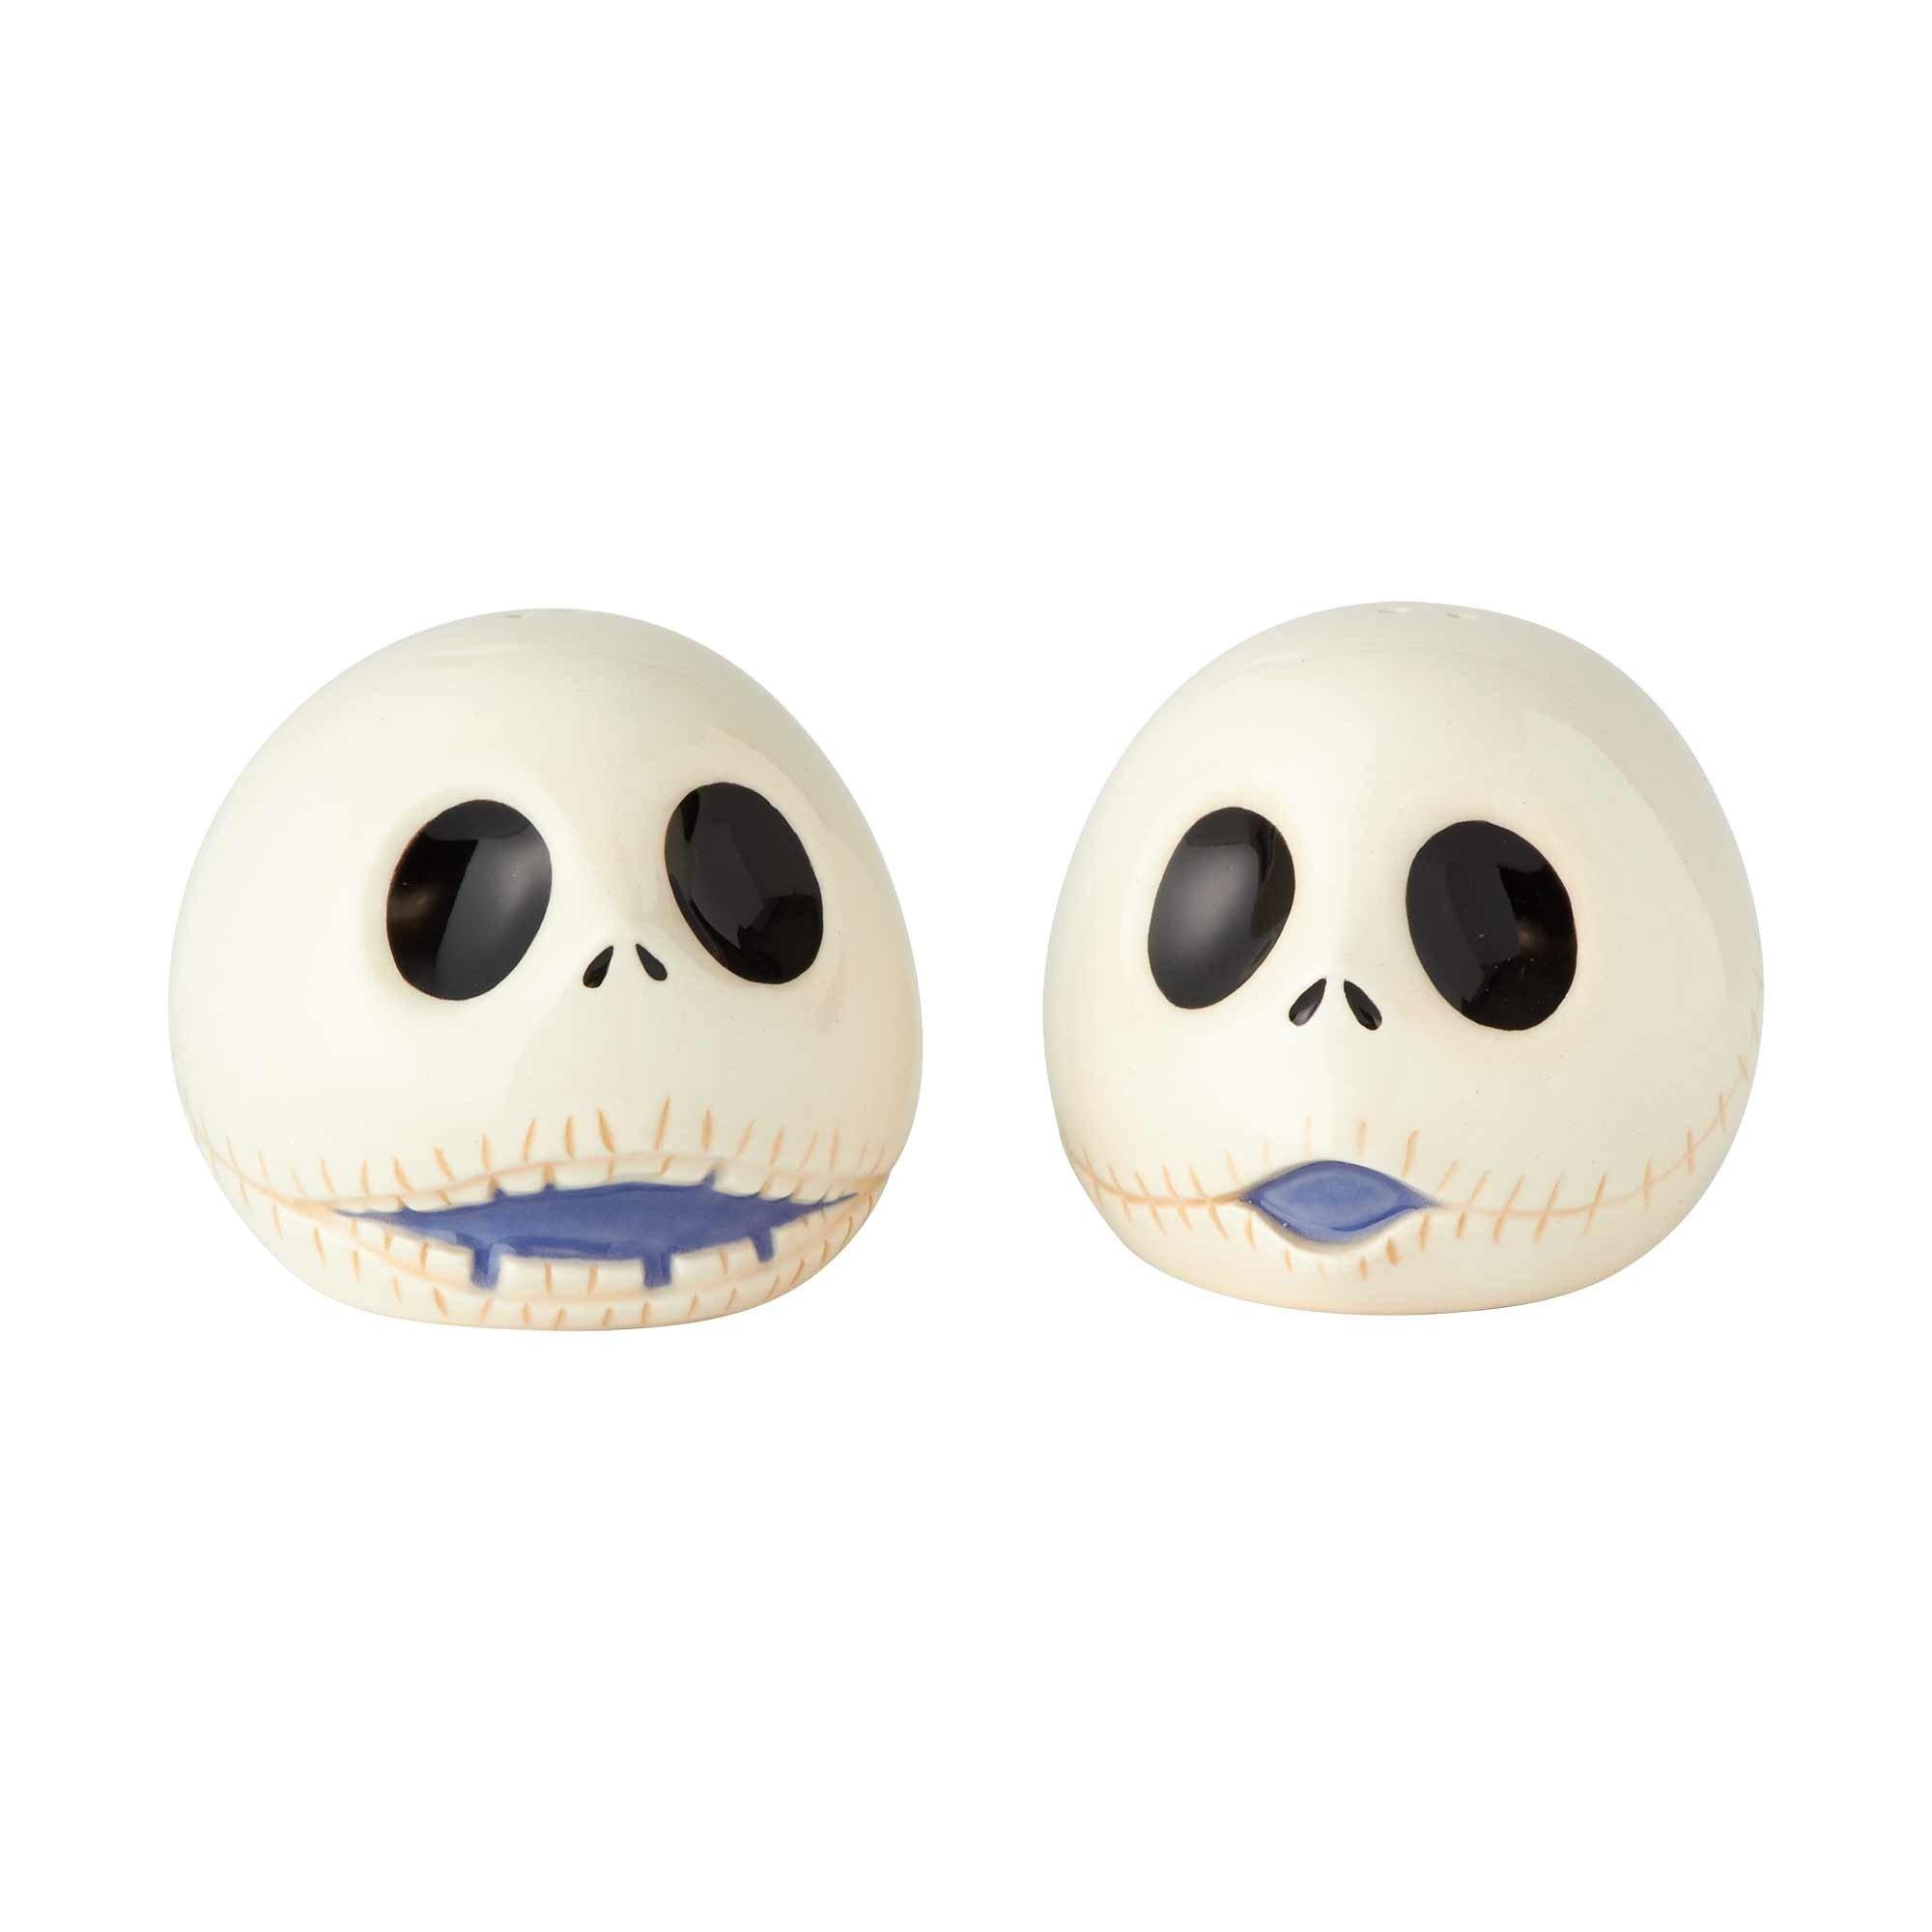 "Enesco Disney Nightmare Before Christmas"" Jack Ceramic Salt and Pepper Shakers, 2.5'', Multicolor"